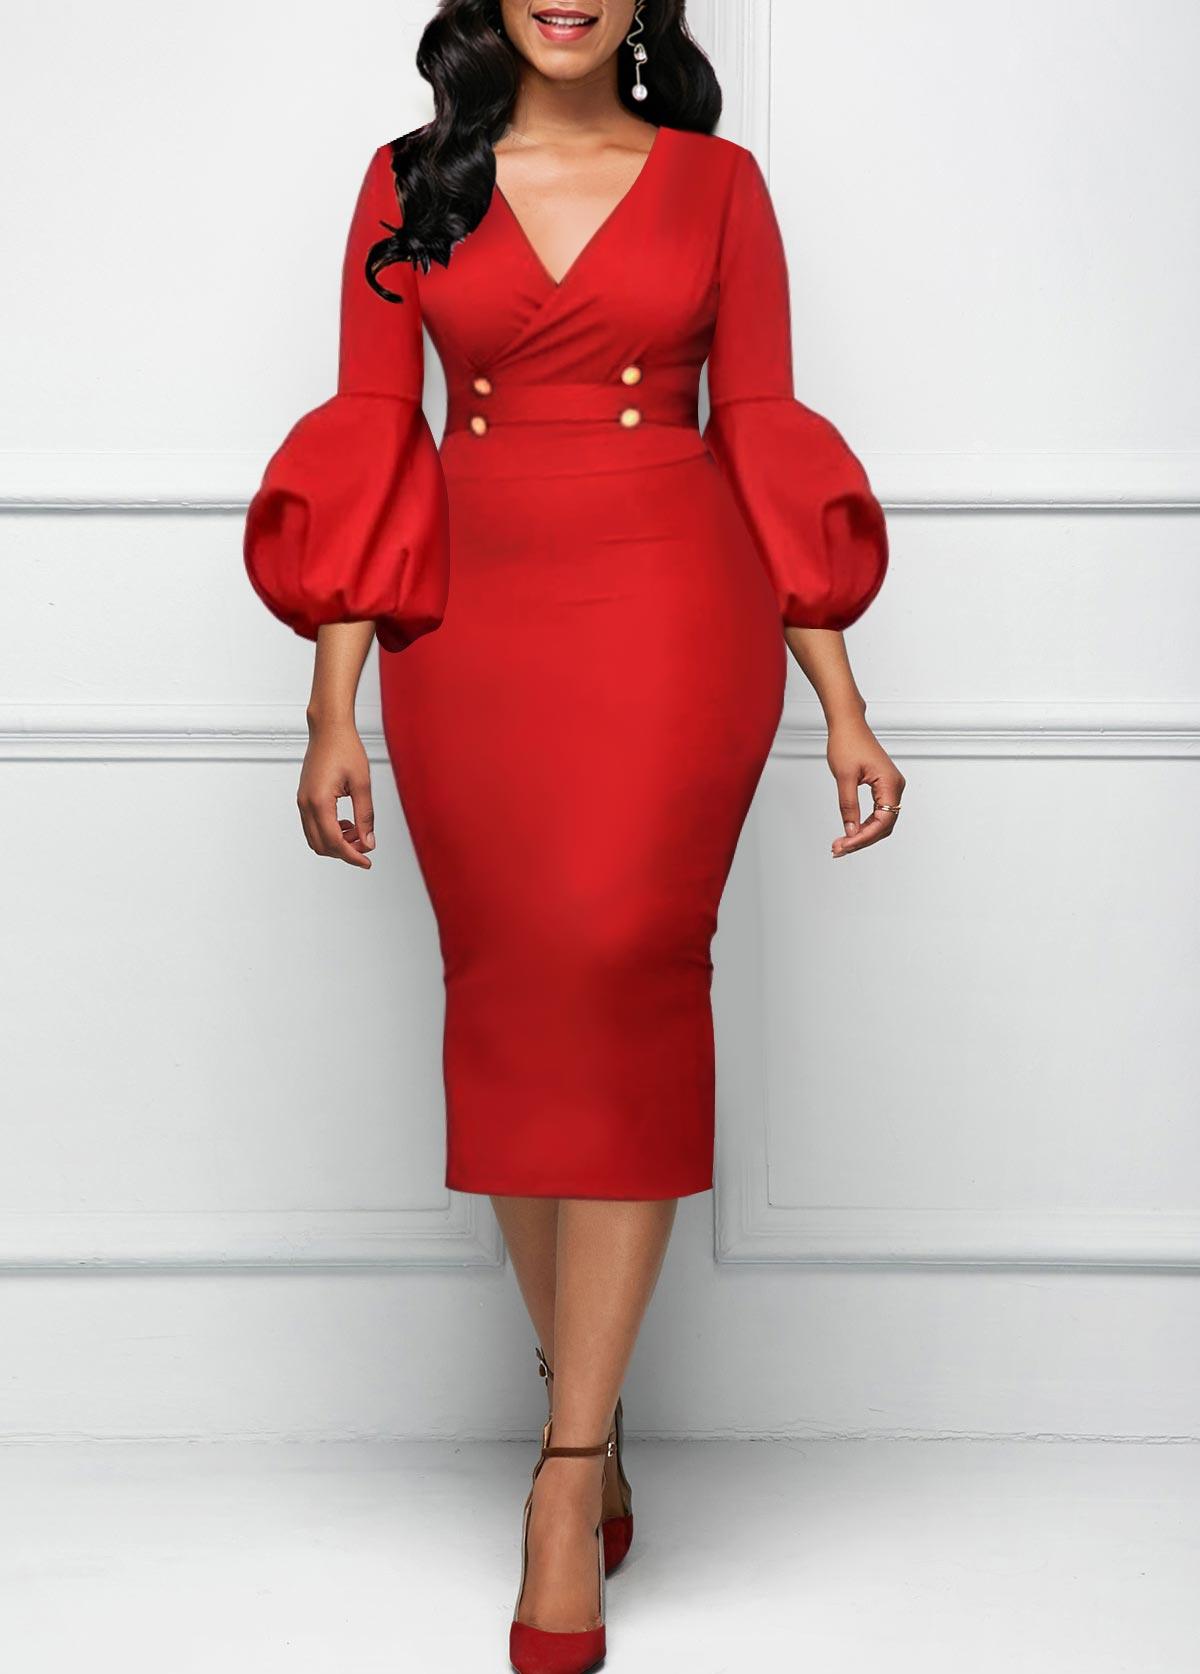 Red High Waist V Neck Dress